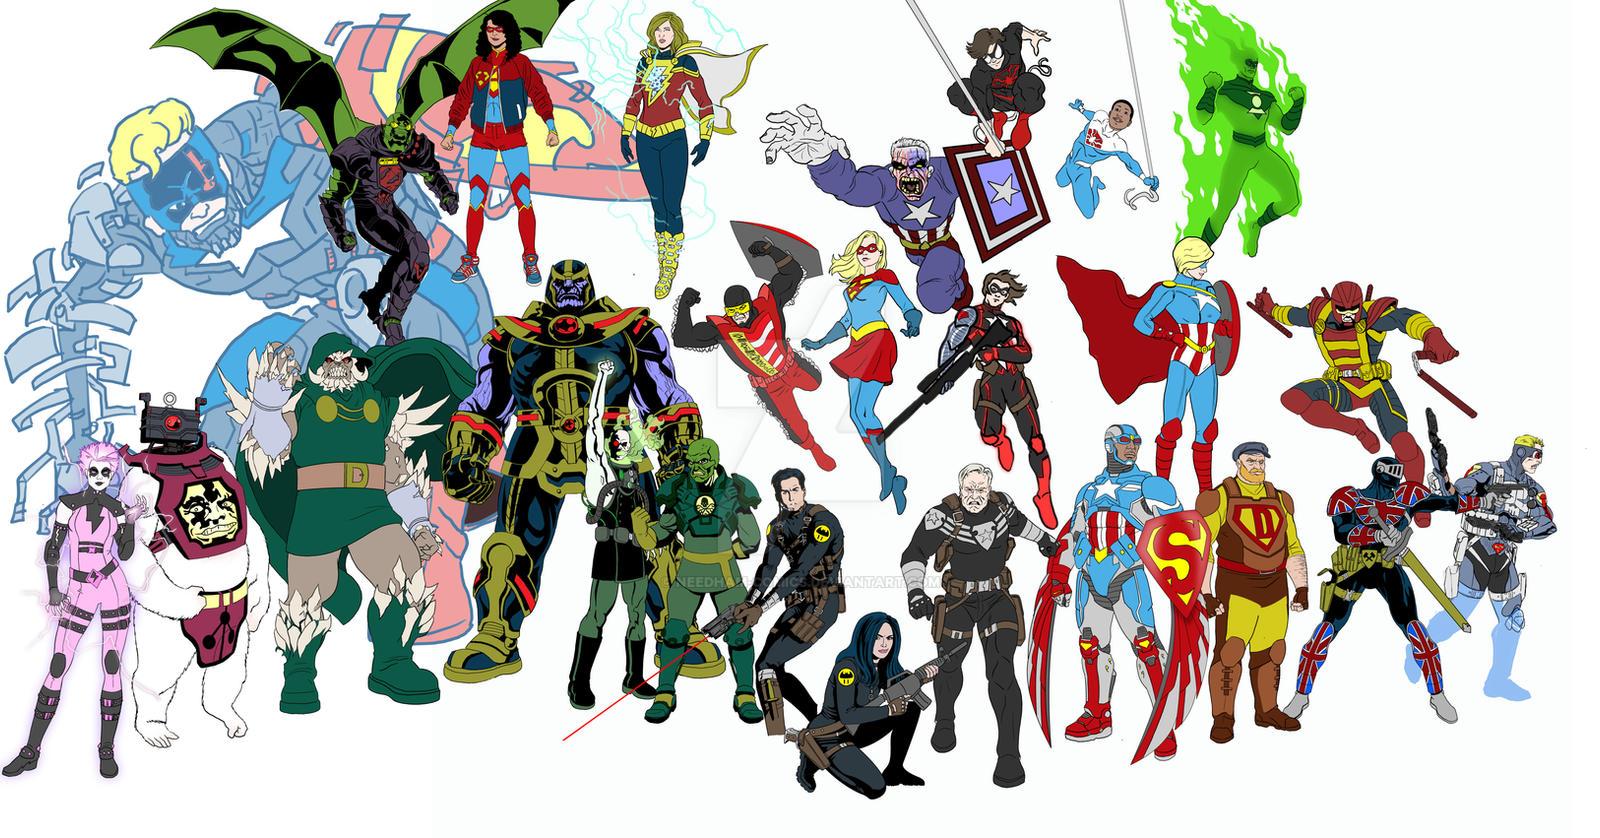 List comics online Viewcomic reading comics online for Amalgam comics characters gallery